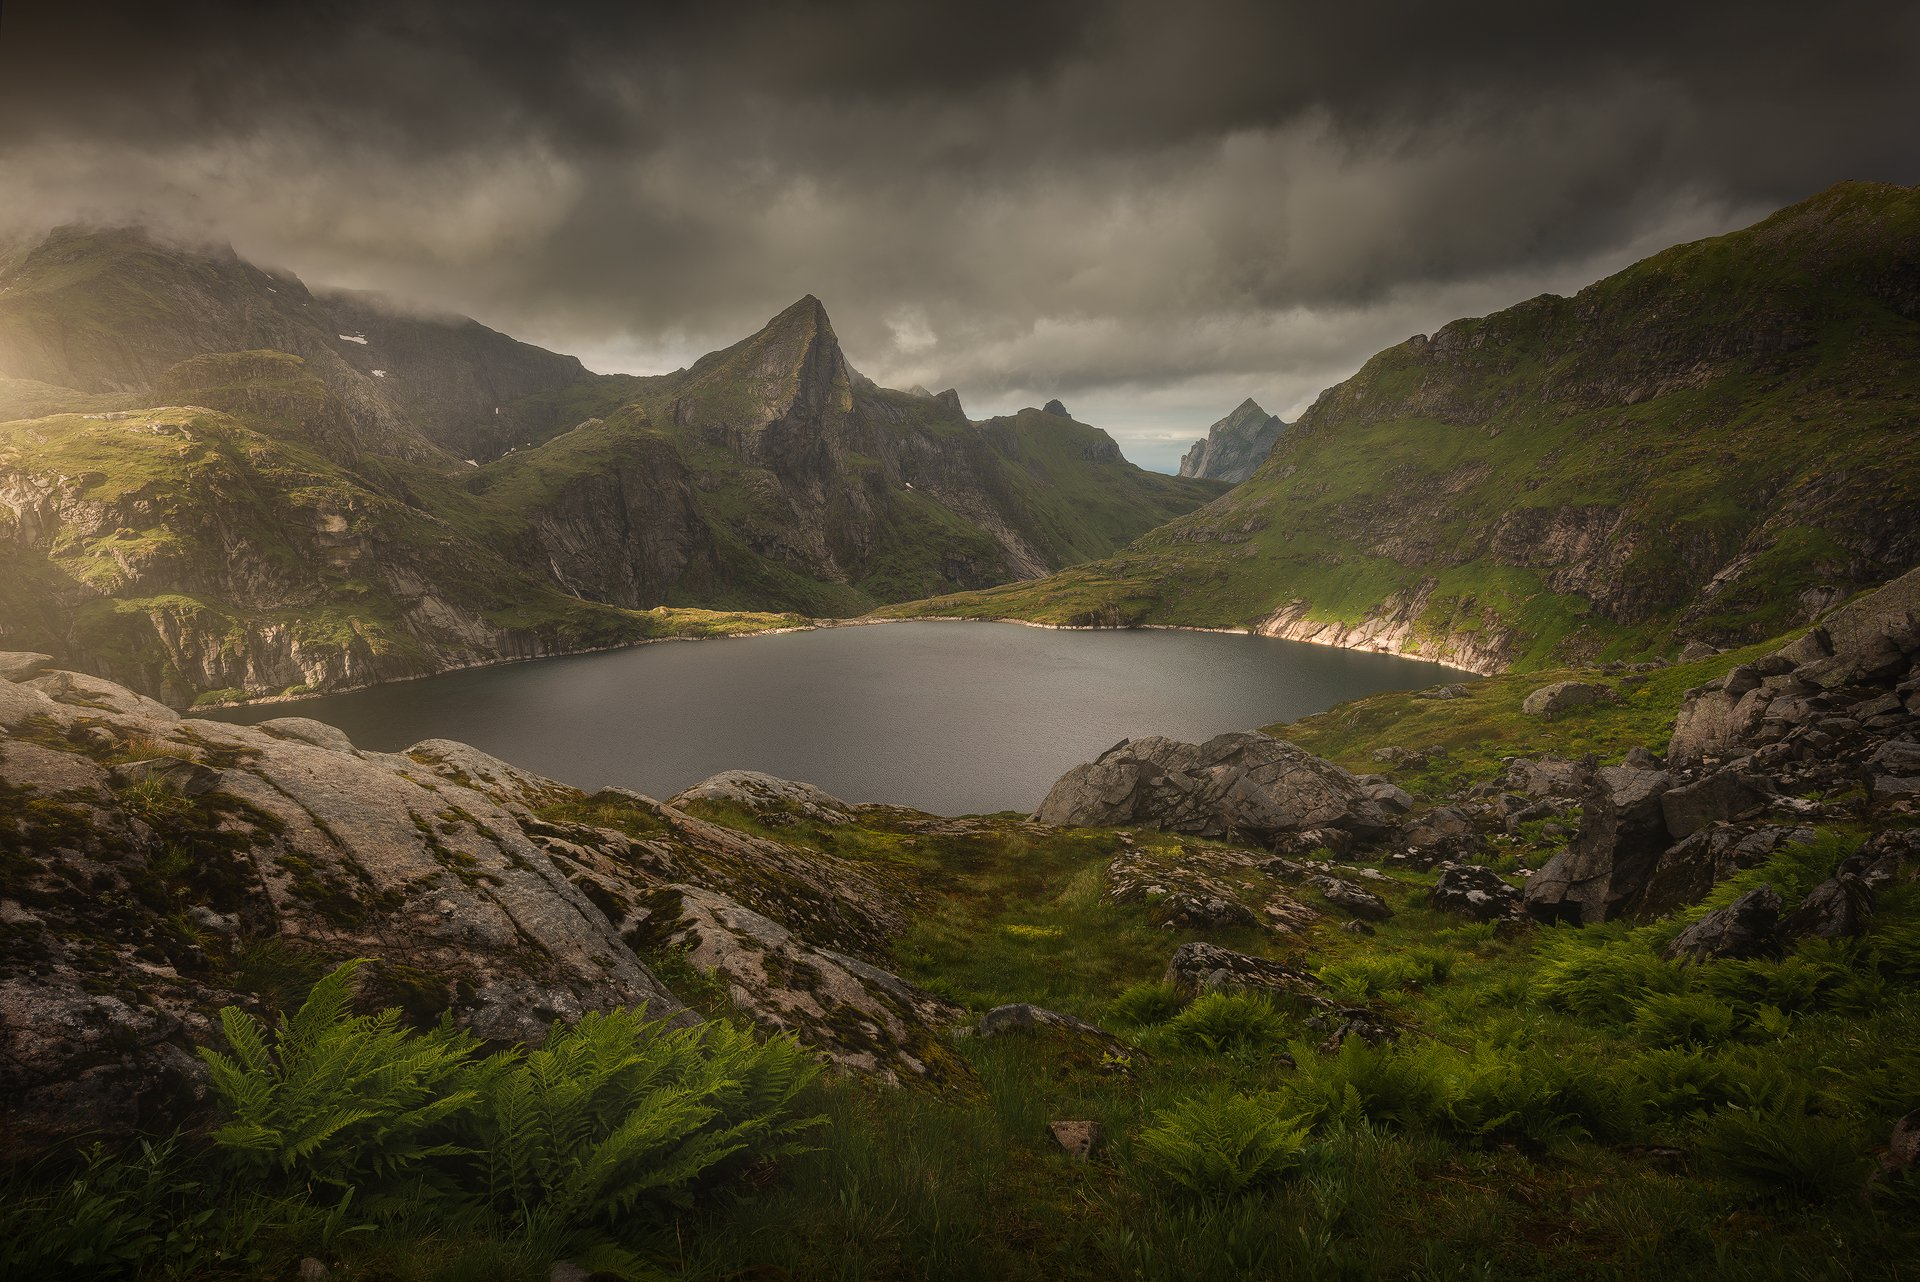 #lofoten, #norway, #summer, #лофотены, #острова, #норвегия, Бахышев Сафар